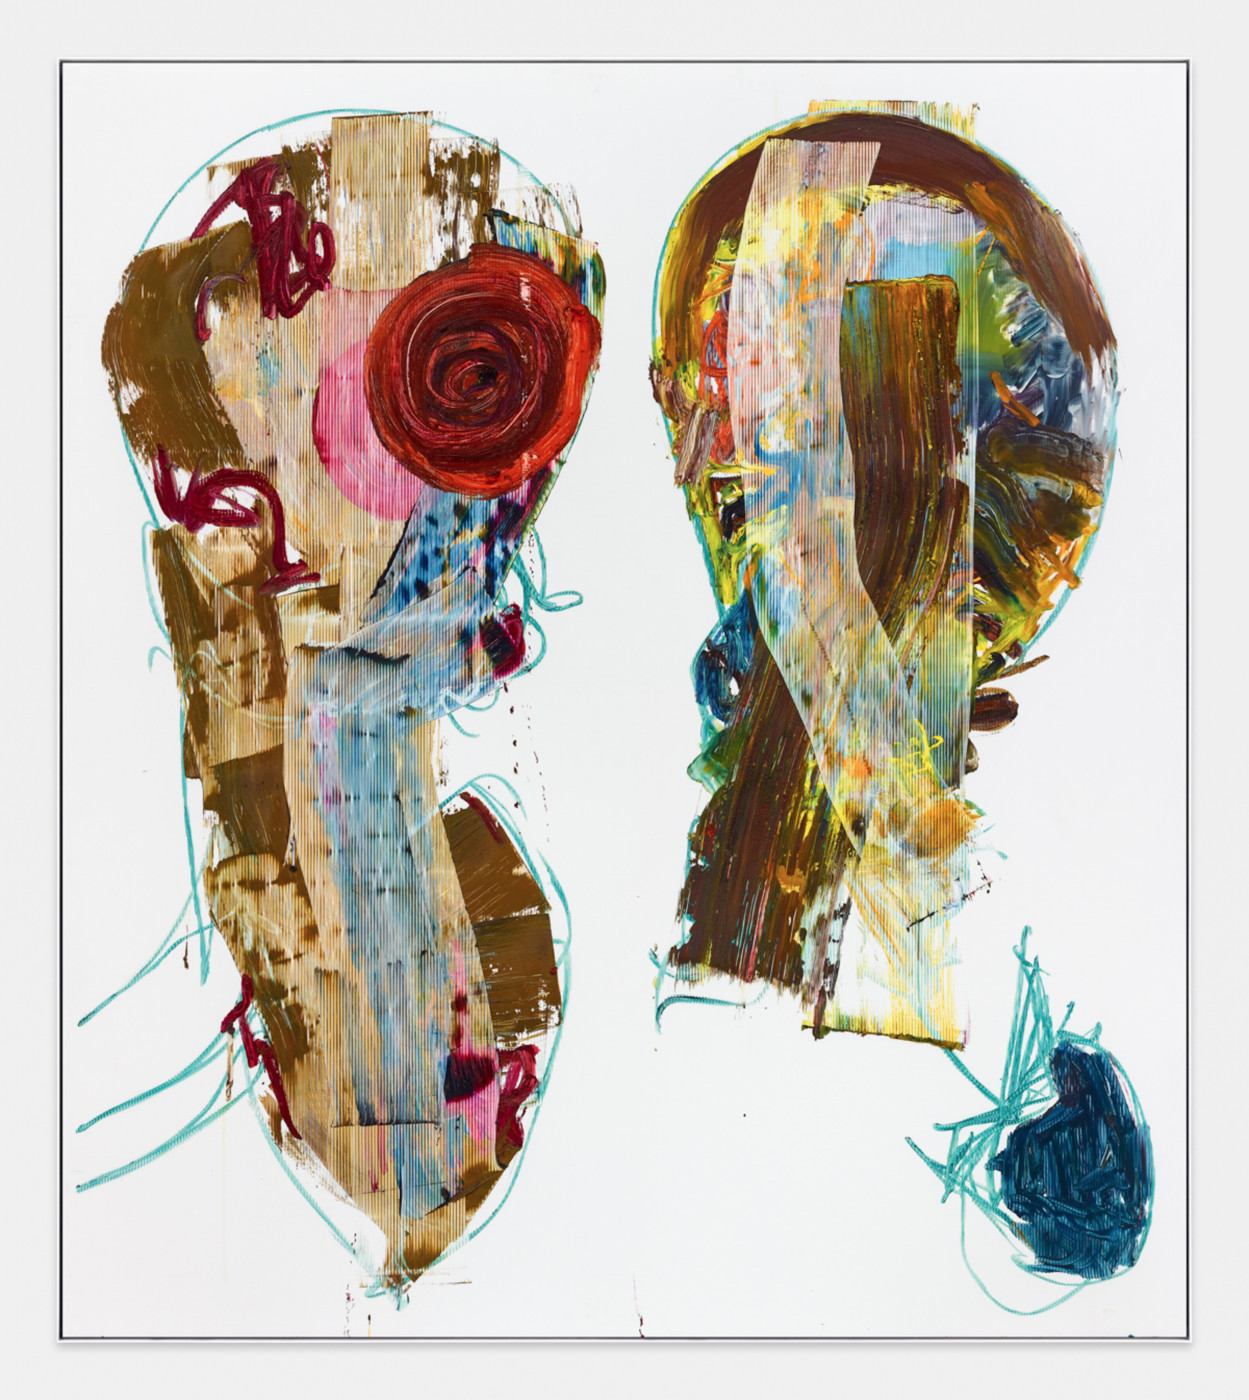 AARON  GARBER-MAIKOVSKA  DAUGHTER DUO 3 , 2019 Oil on fluted polyboard 231.7 × 205.7 cm / 91.25 × 80.9 in - High Art Gallery Paris